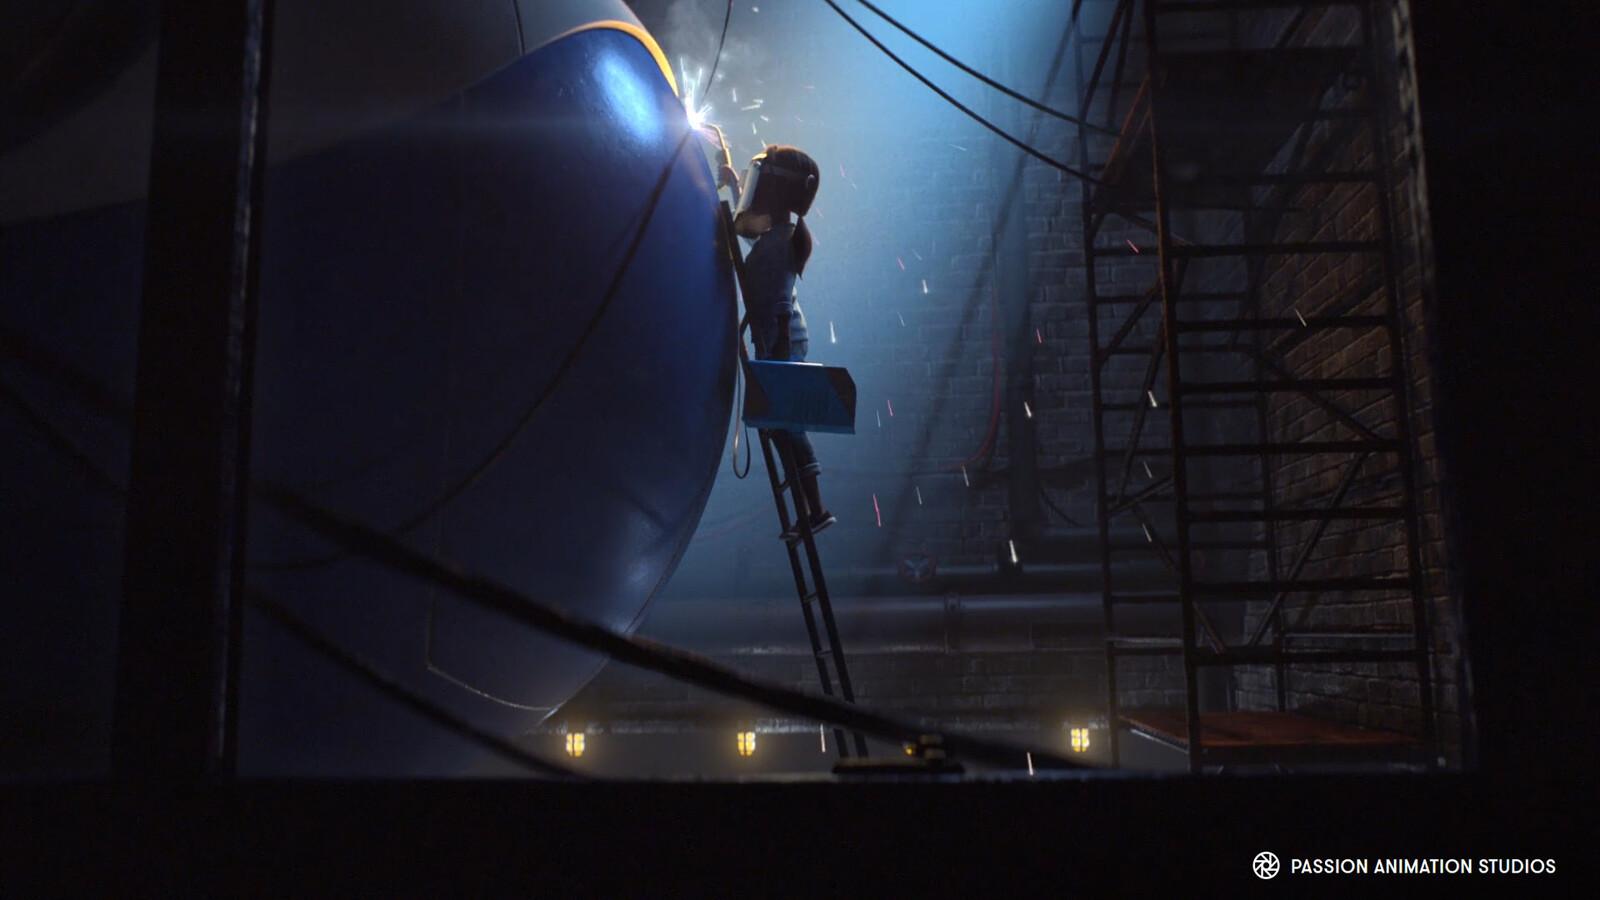 Giant robot, welder, welding mask and environment modeling